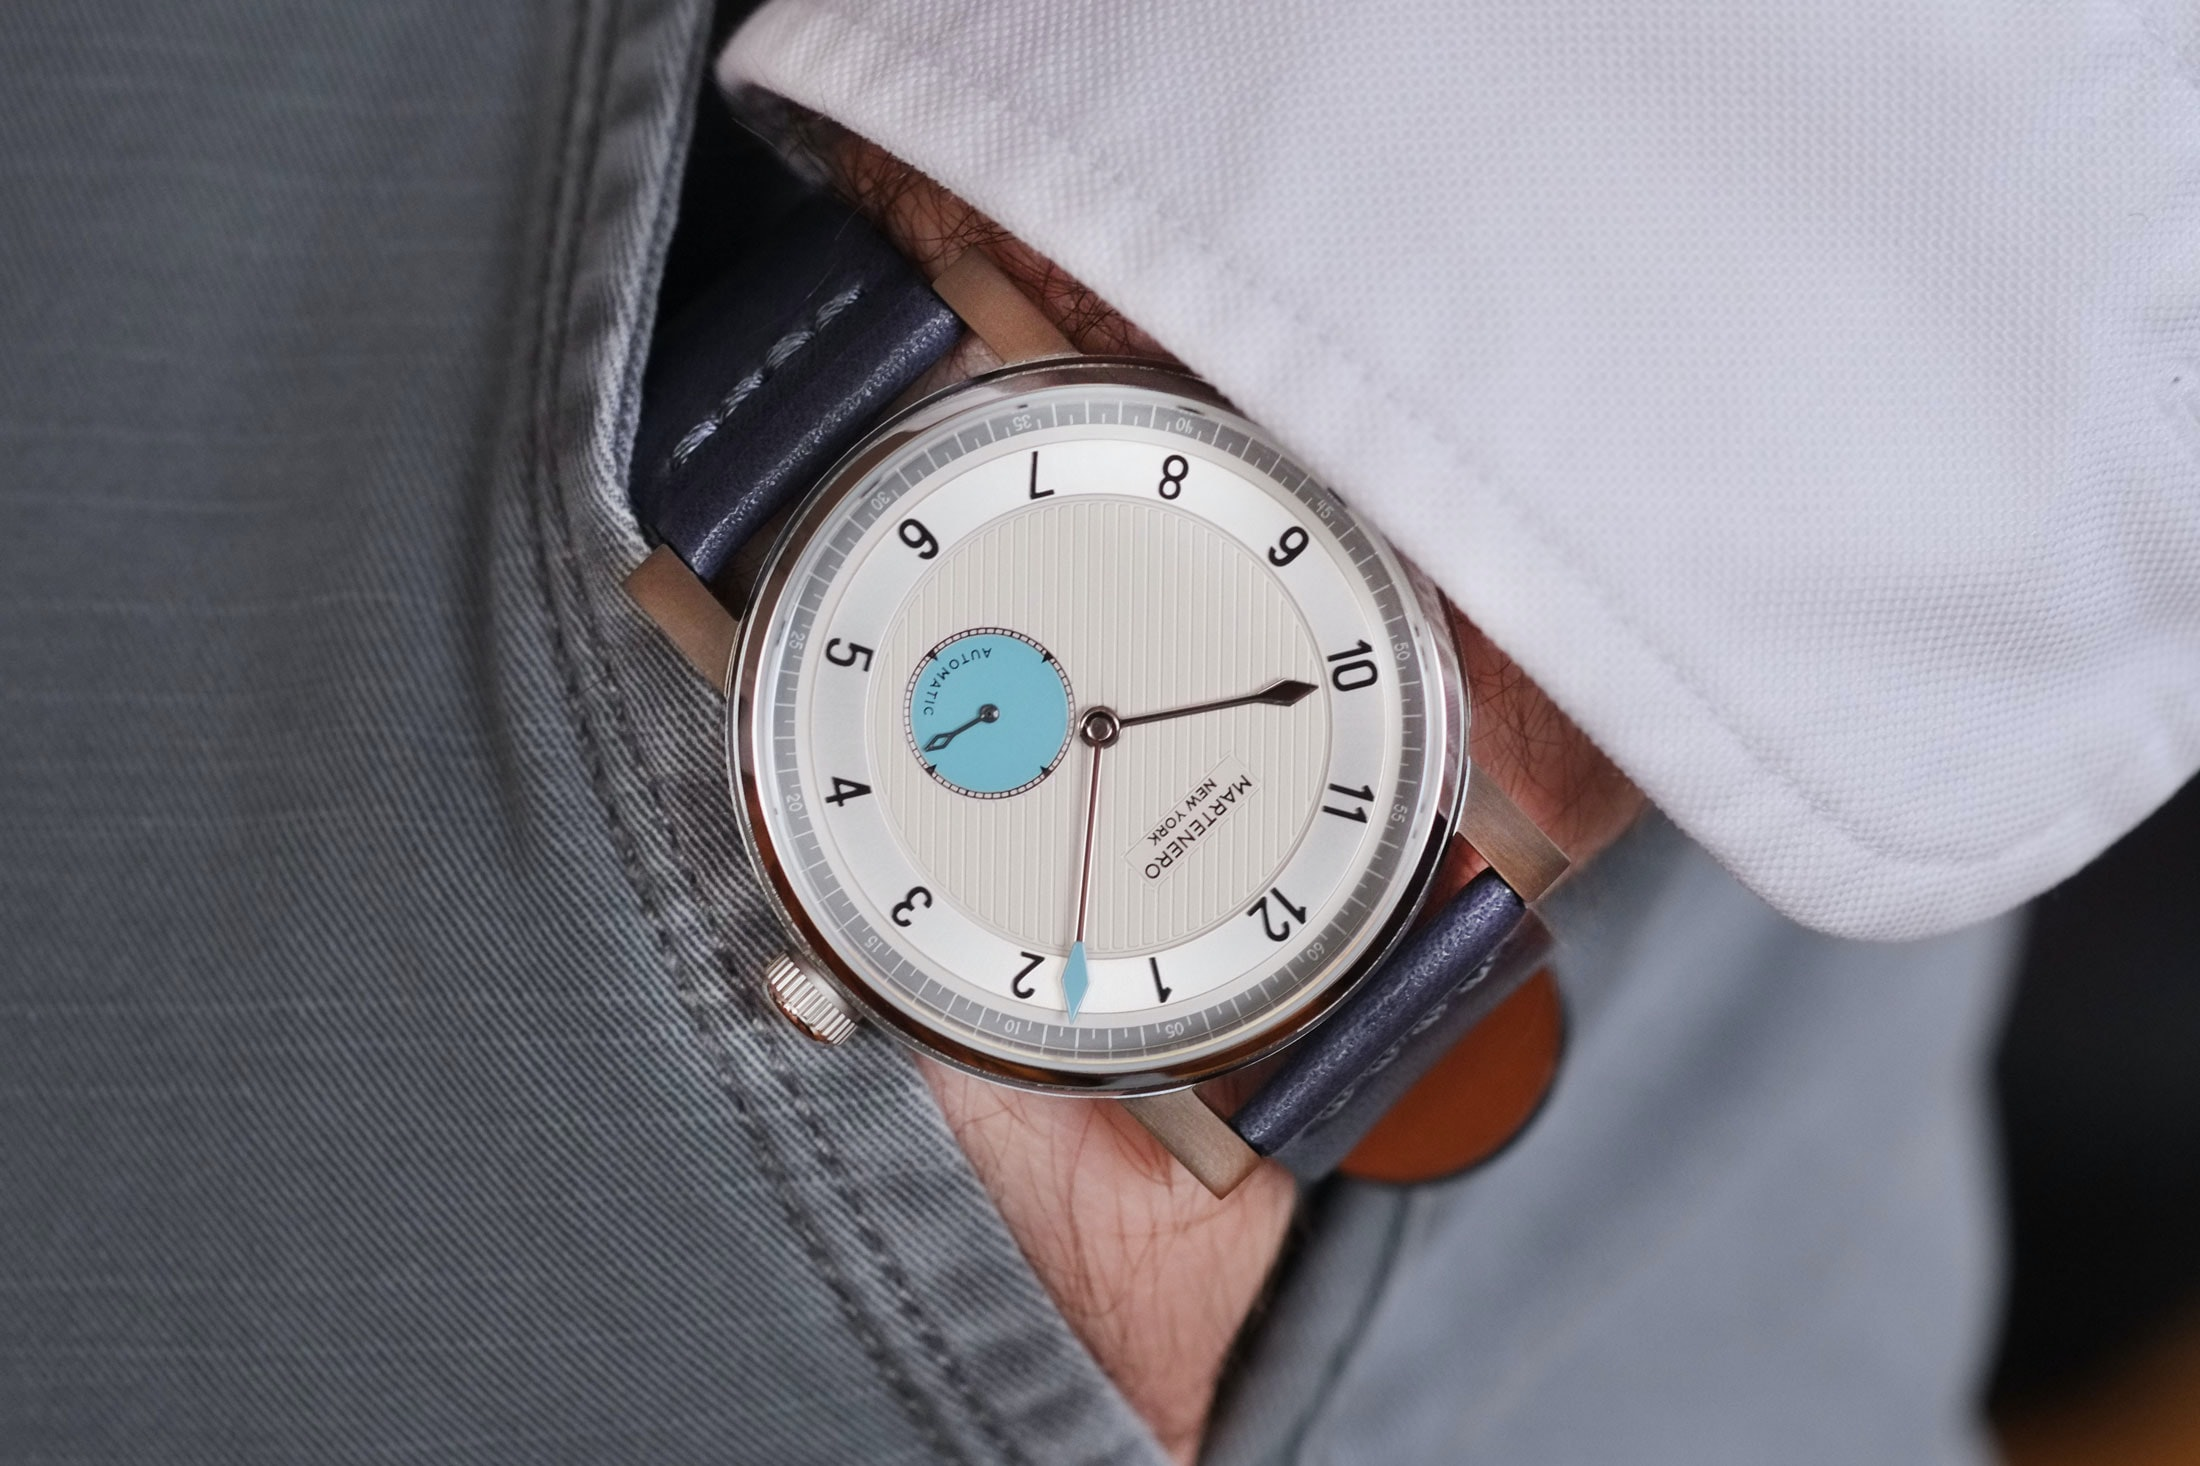 martenero edgemere wrist shot Hands-On: The Martenero Edgemere, A Marine Chronometer-Inspired Watch Designed In New York Hands-On: The Martenero Edgemere, A Marine Chronometer-Inspired Watch Designed In New York martenero 02